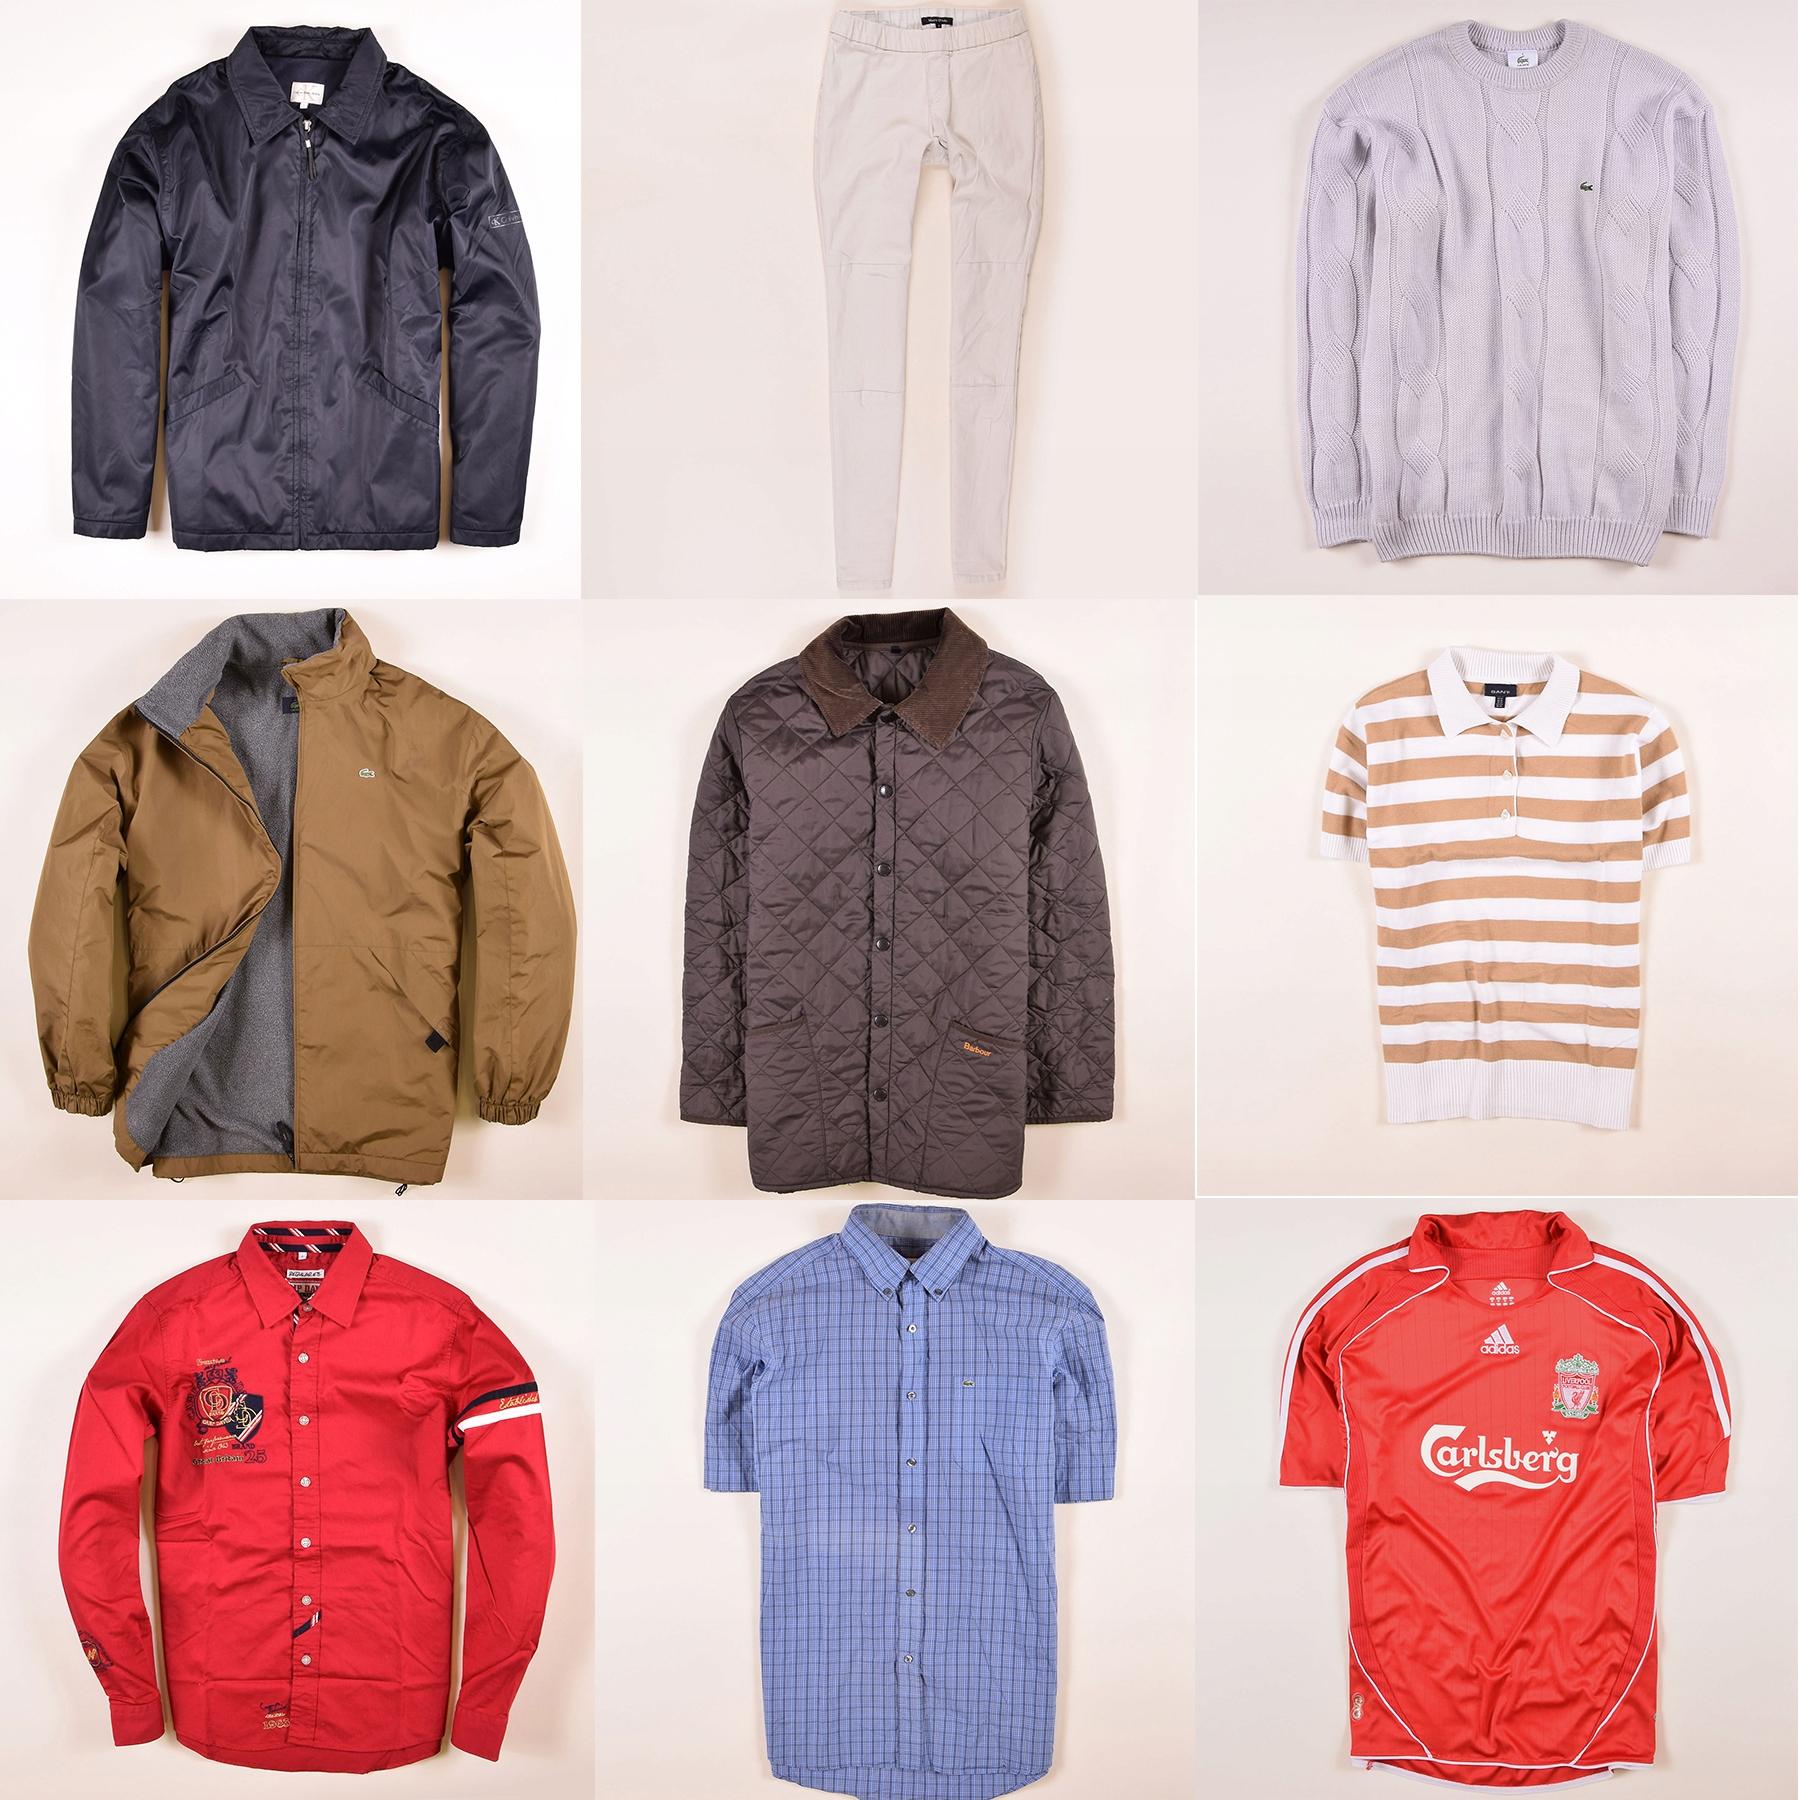 zestaw ubrań Lacoste Ralph Barbour Gant 45 sztuk